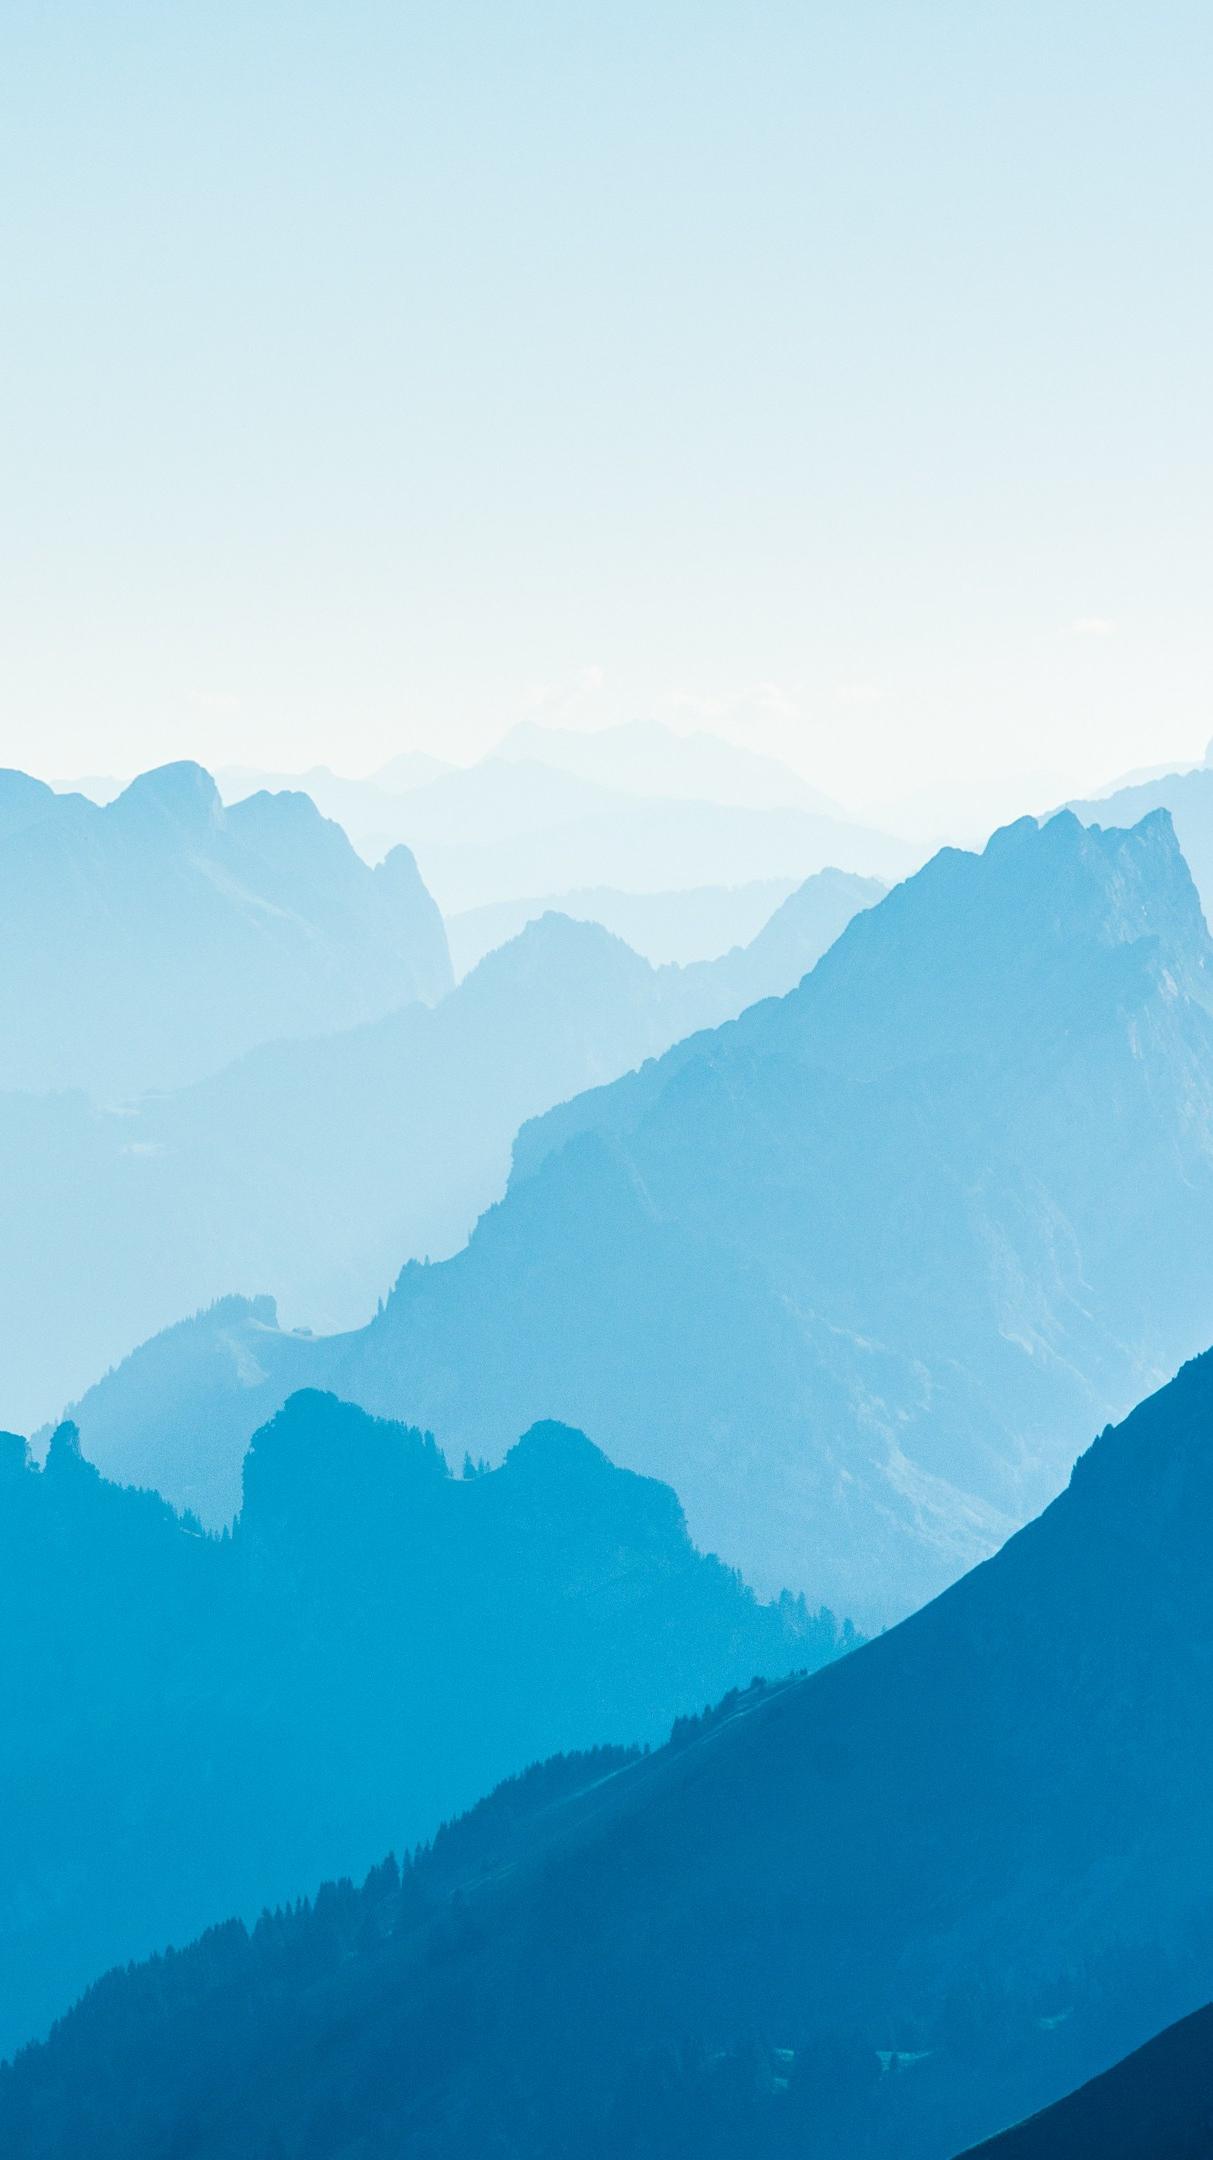 Cute Yoda Wallpaper Sunrise Mountains Fog Nature Iphone Wallpaper Iphone